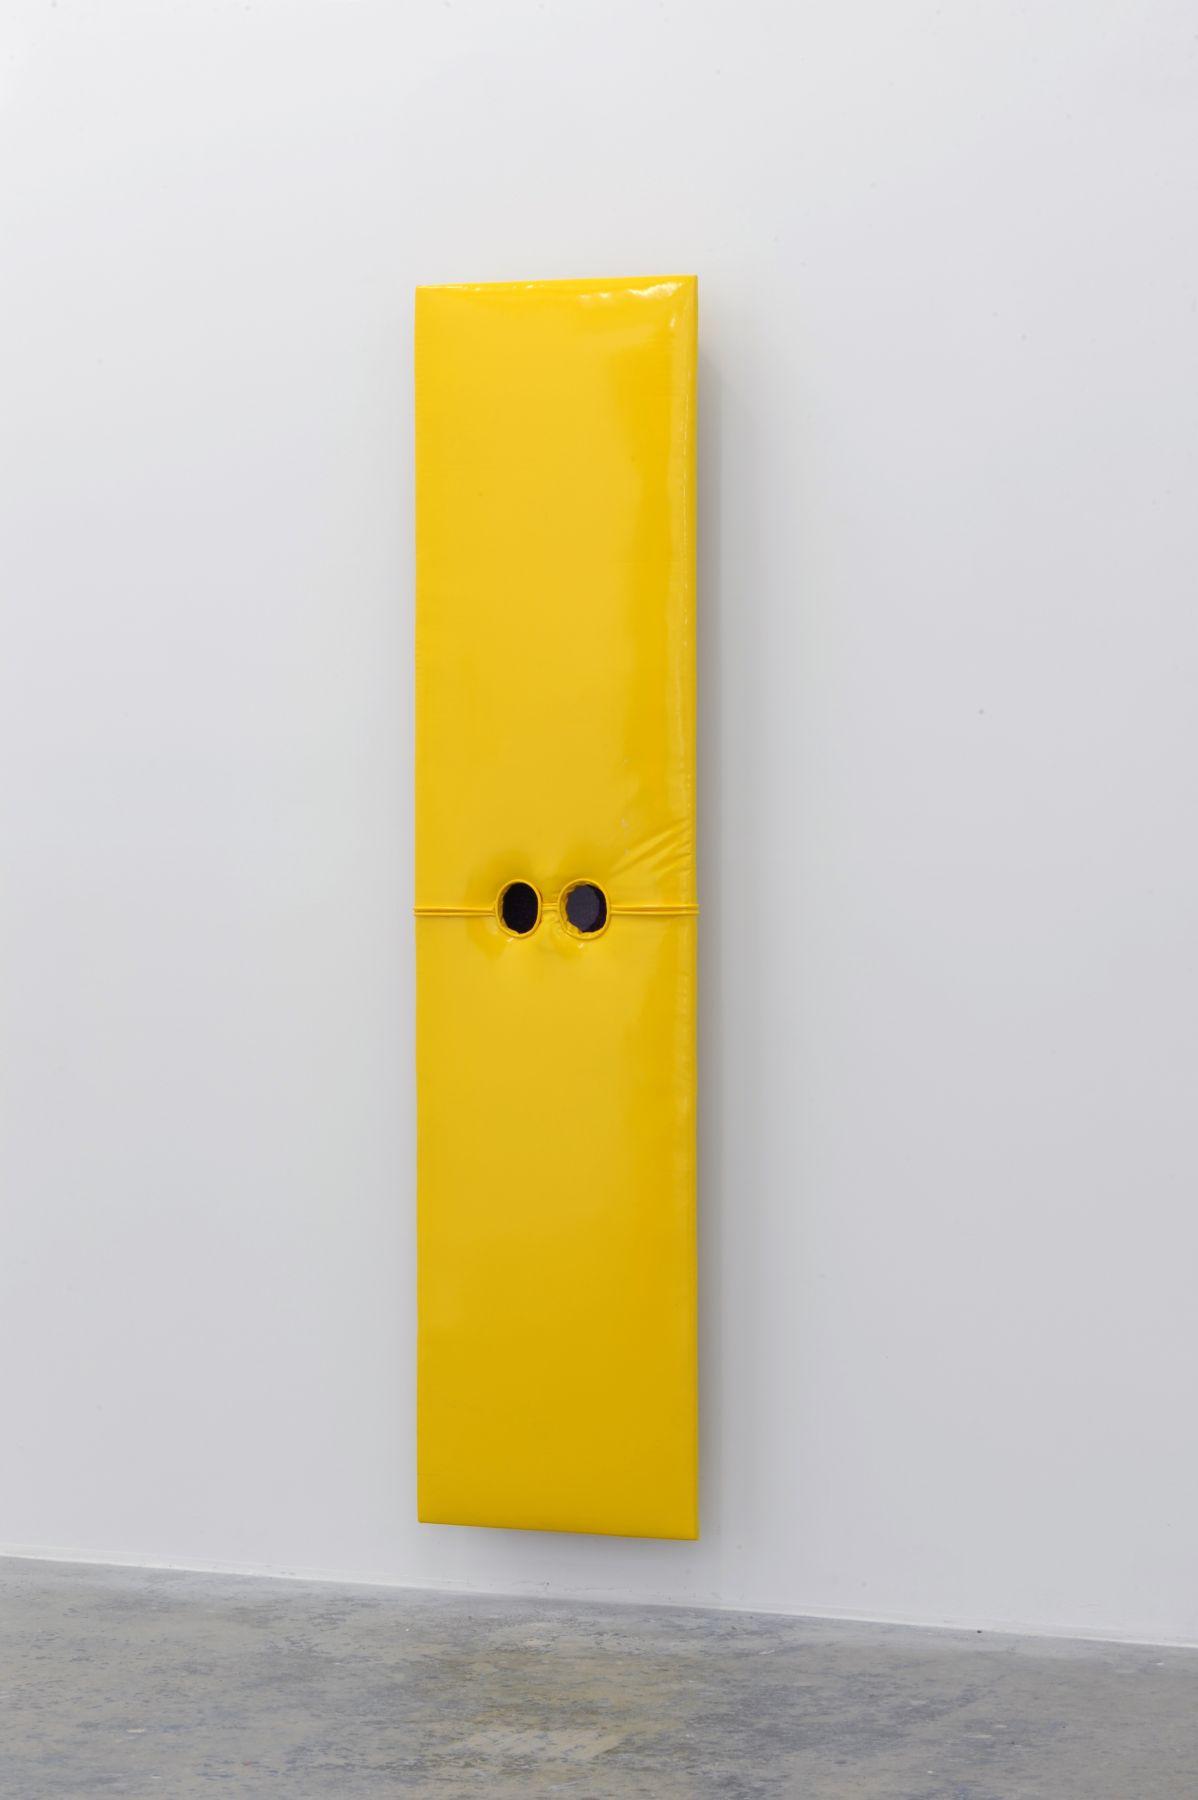 JOE OVELMAN Self Portrait Yellow Vinyl 2011, reclaimed wood, vinyl, plastic, 68 x 17 x 5 inches.